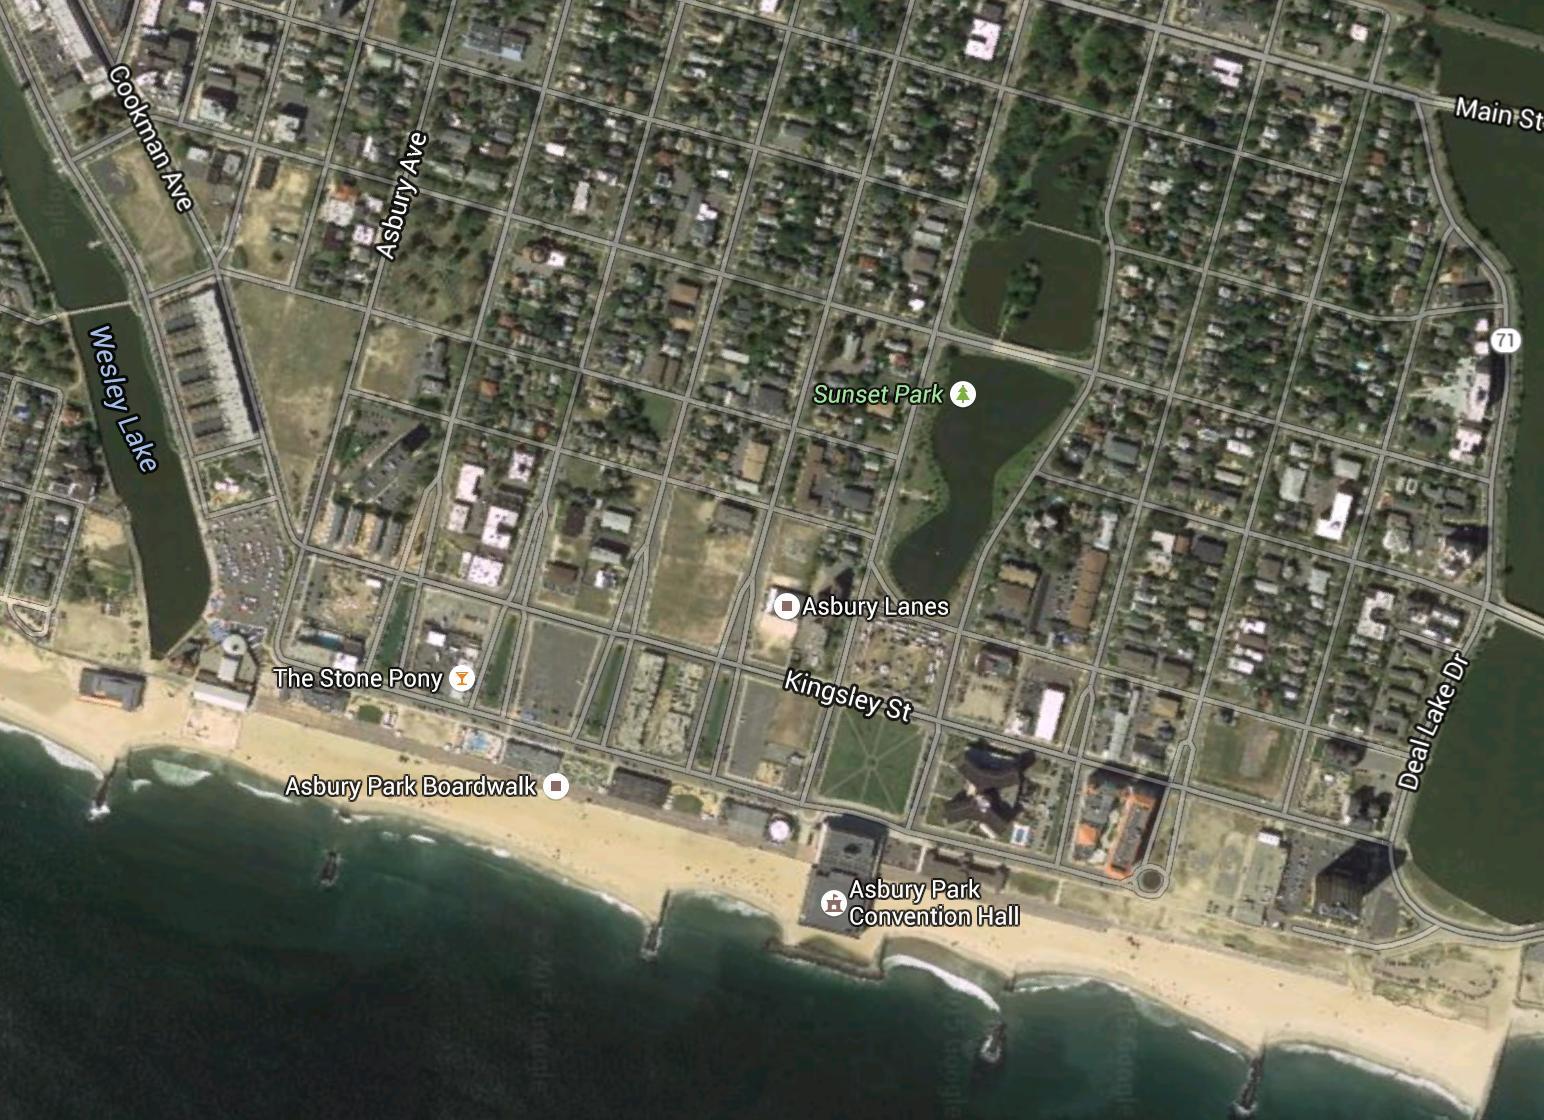 Asbury Park Waterfront Redevelopment